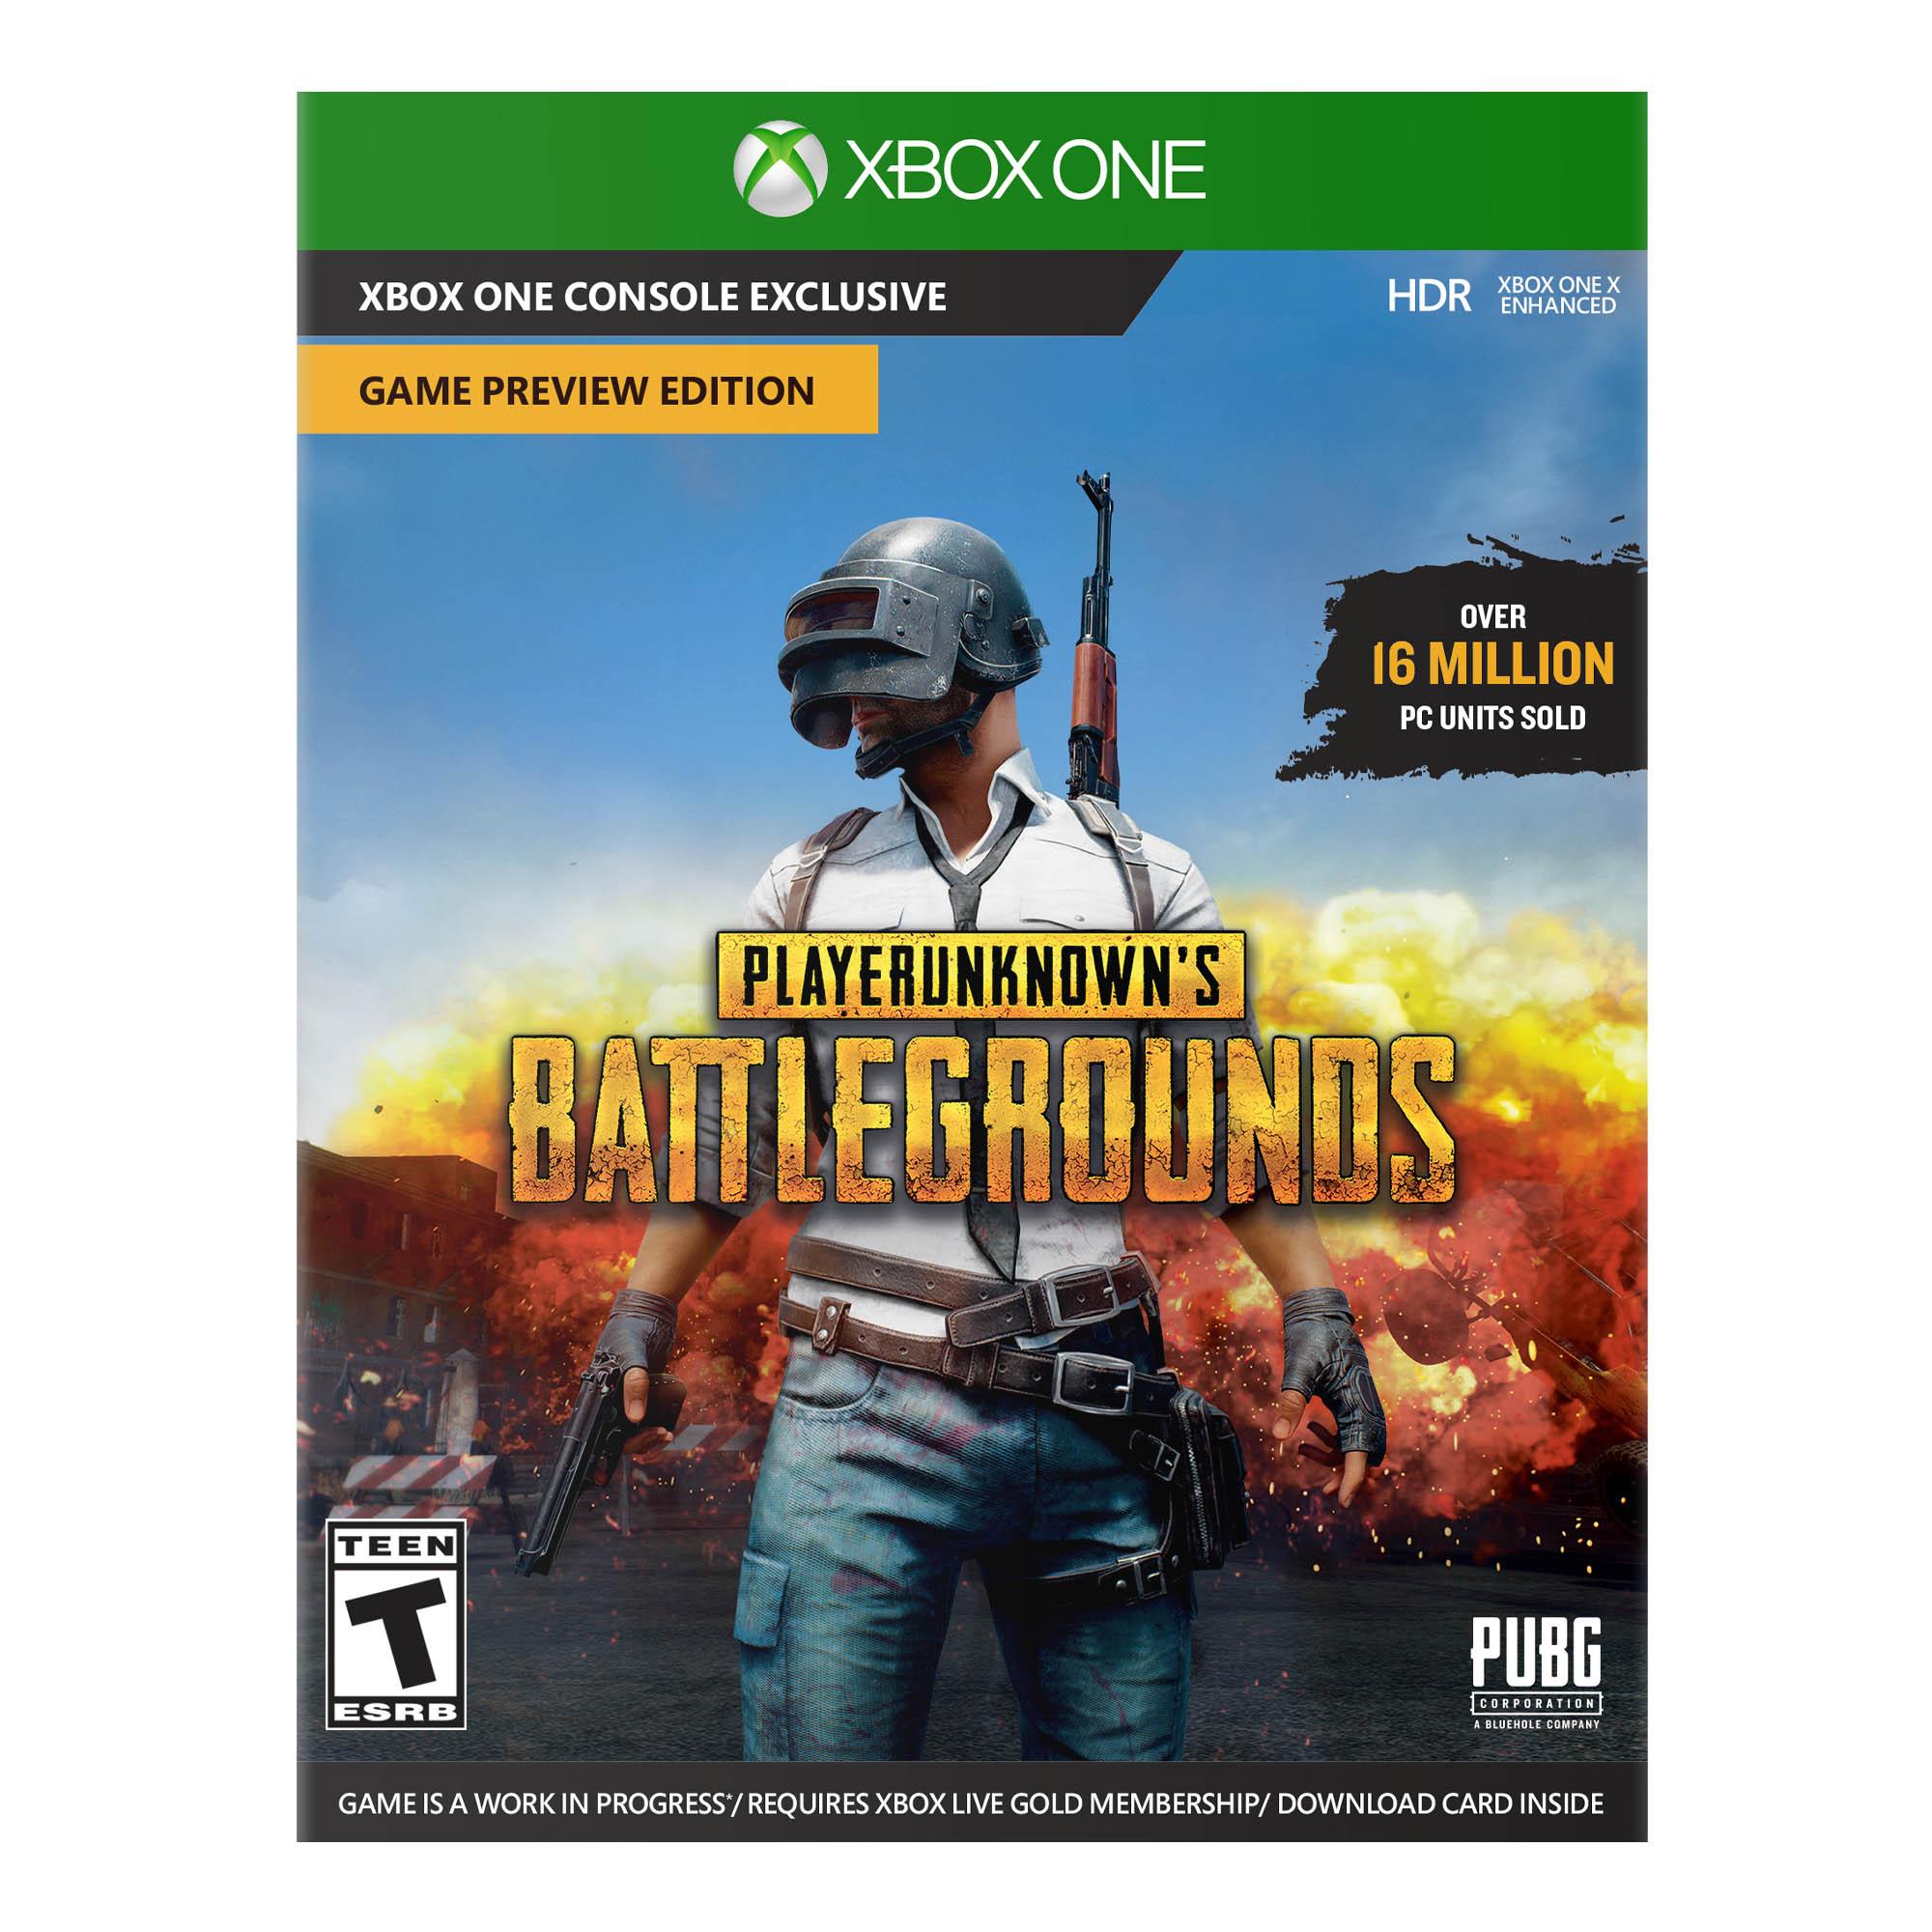 YMMV Walmart with $4 xbox games $4.00